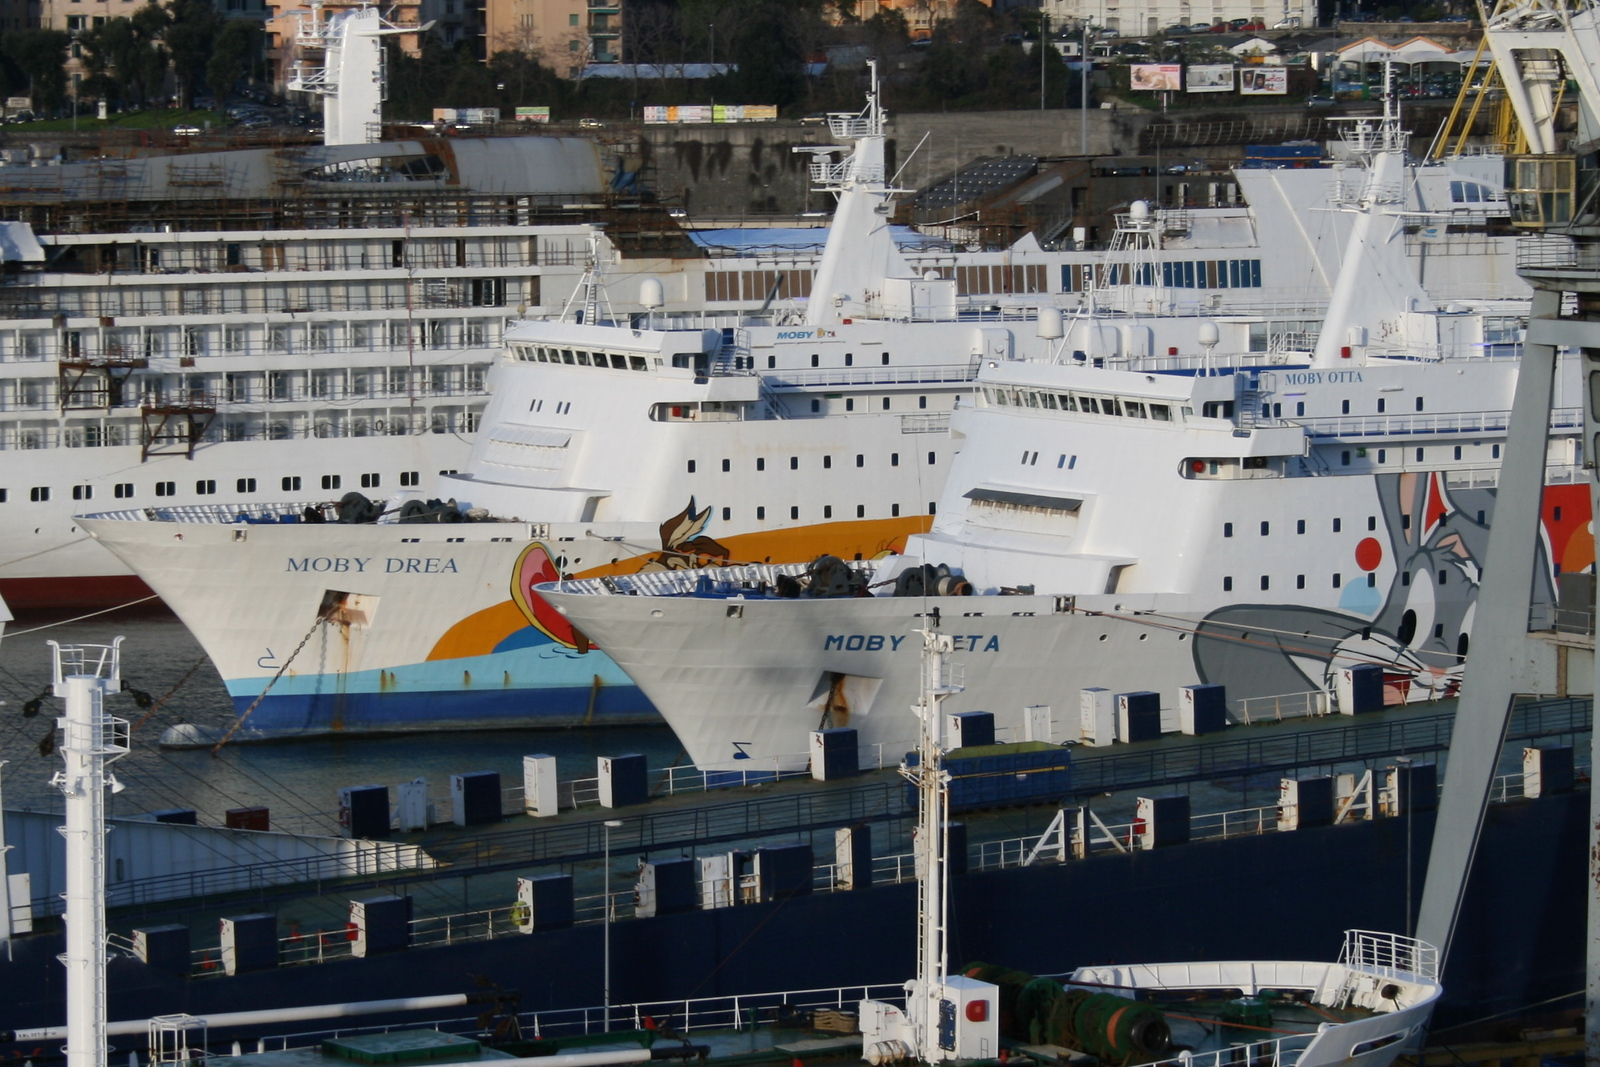 2009 - F/B MOBY OTTA & MOBY DREA : winter laid-up in Genova.